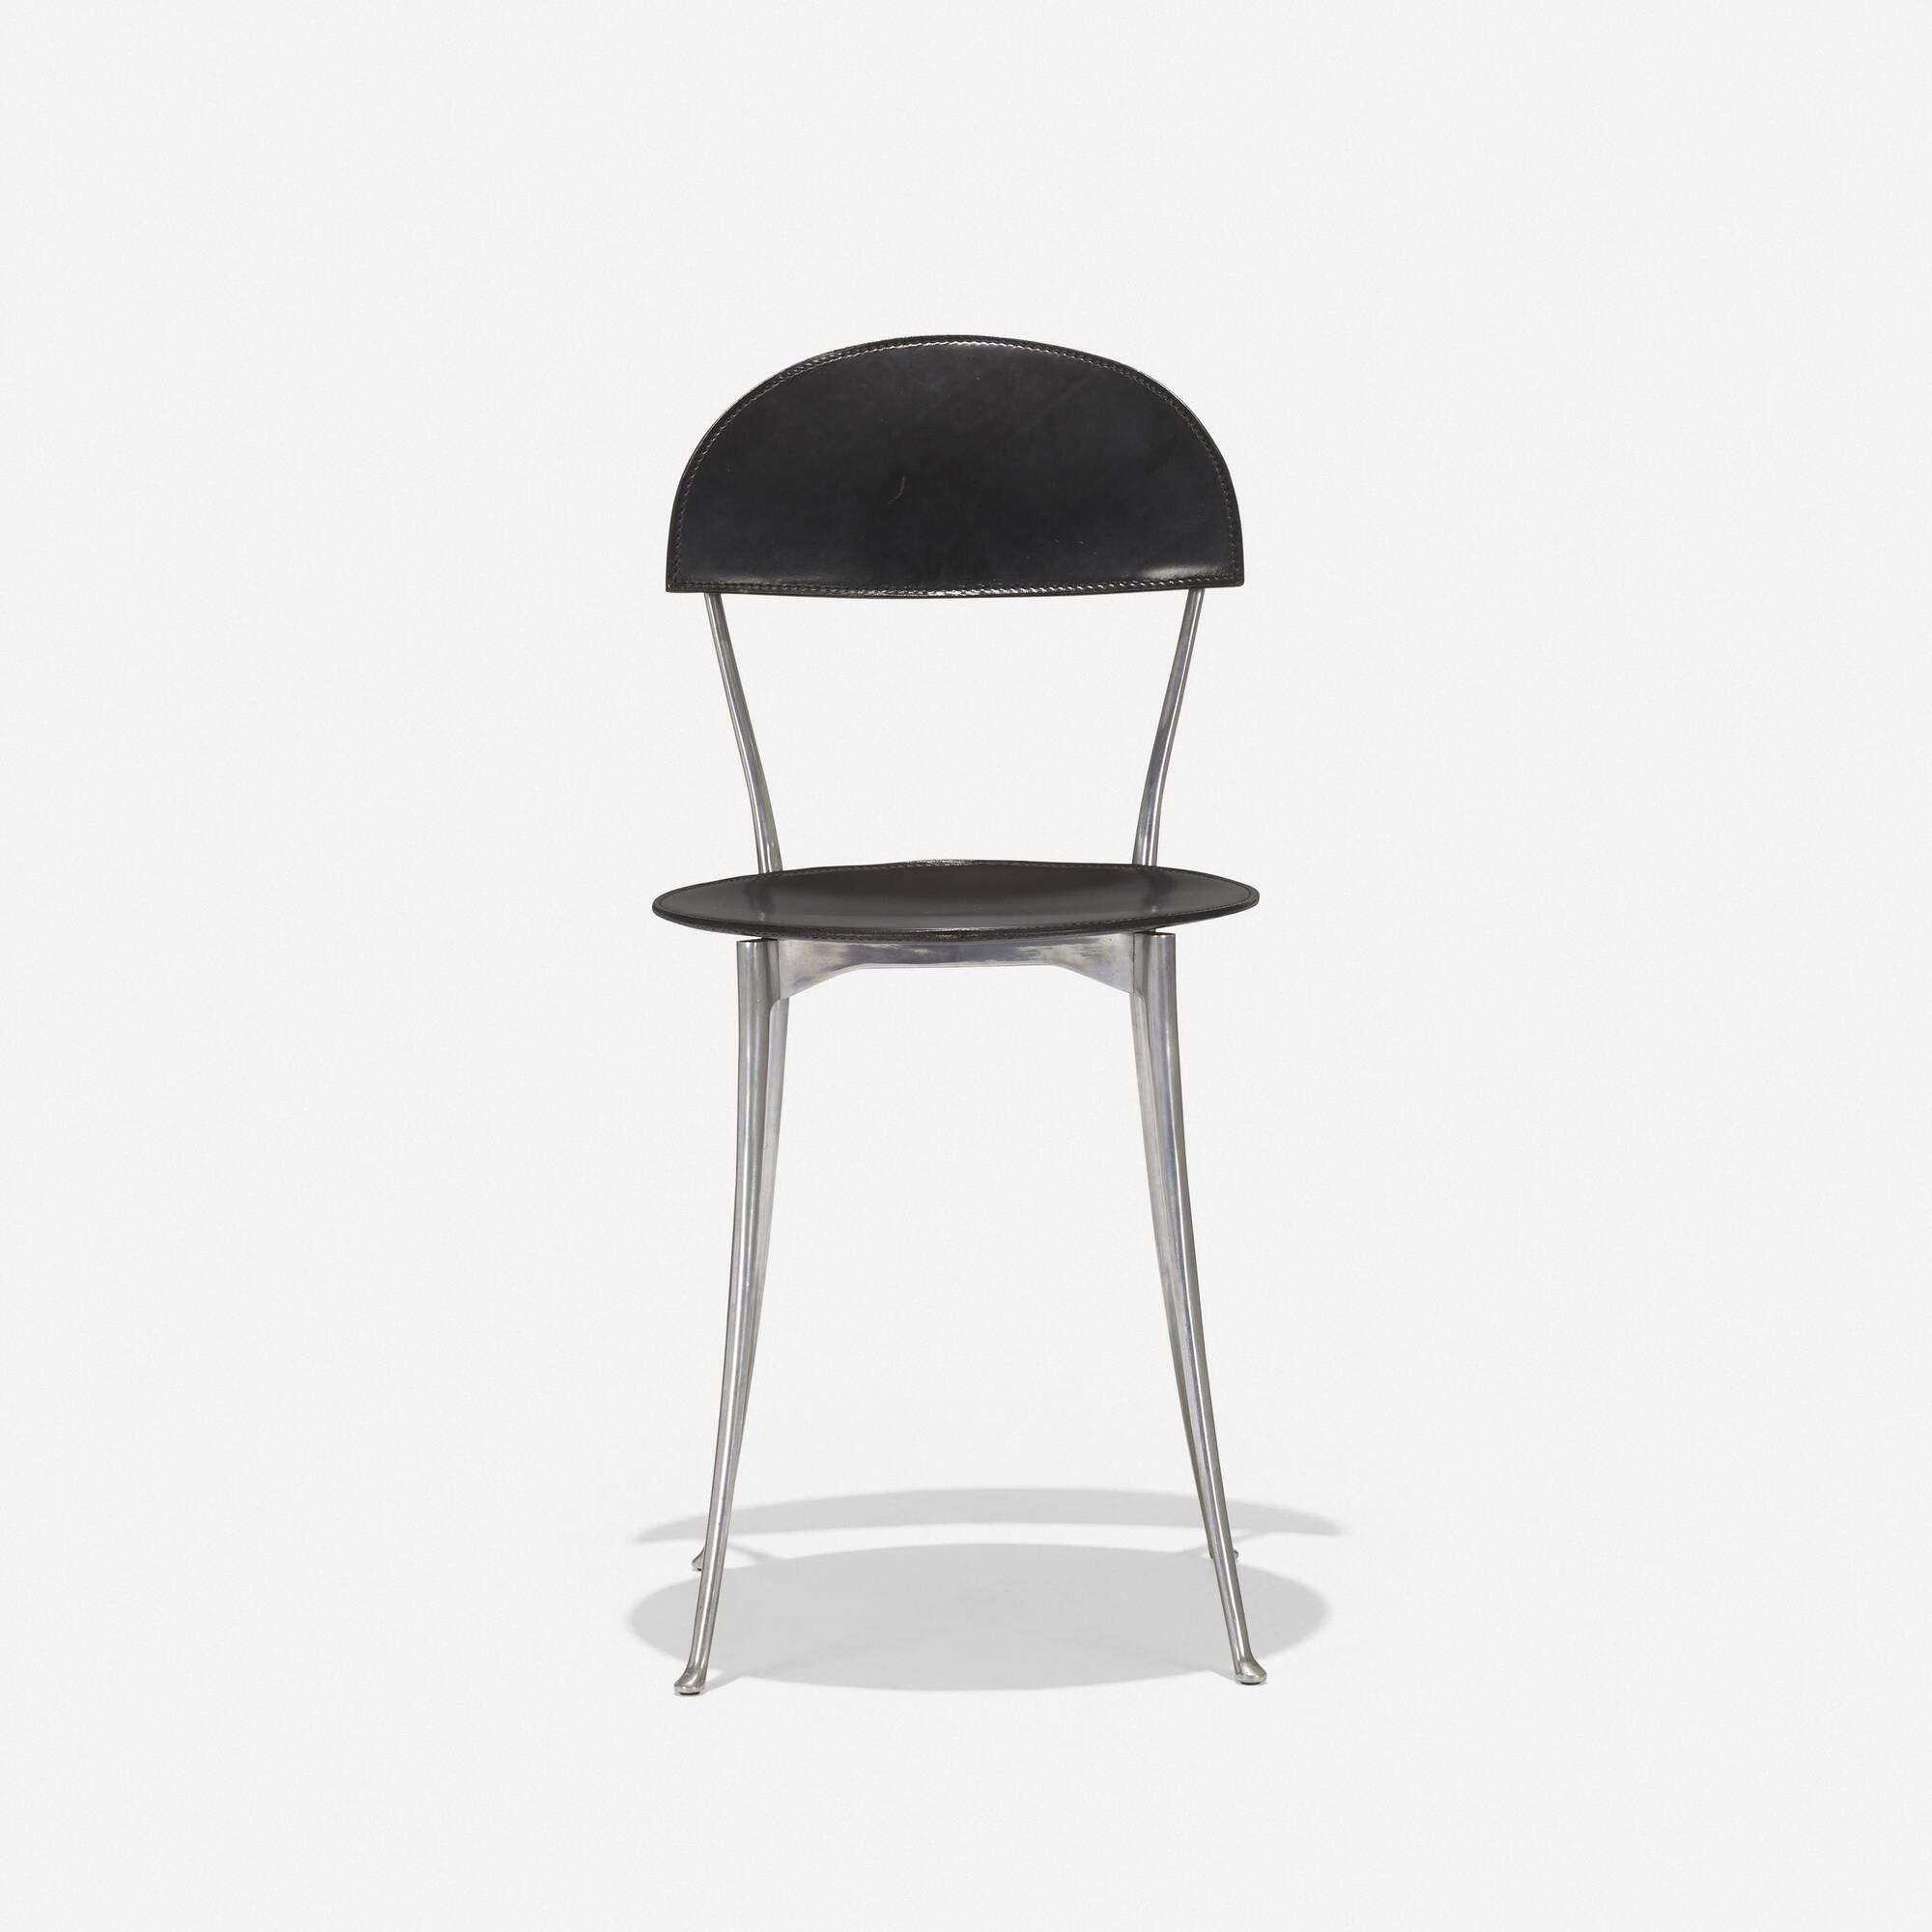 418: Enzo Mari / Tonietta chair (2 of 4)